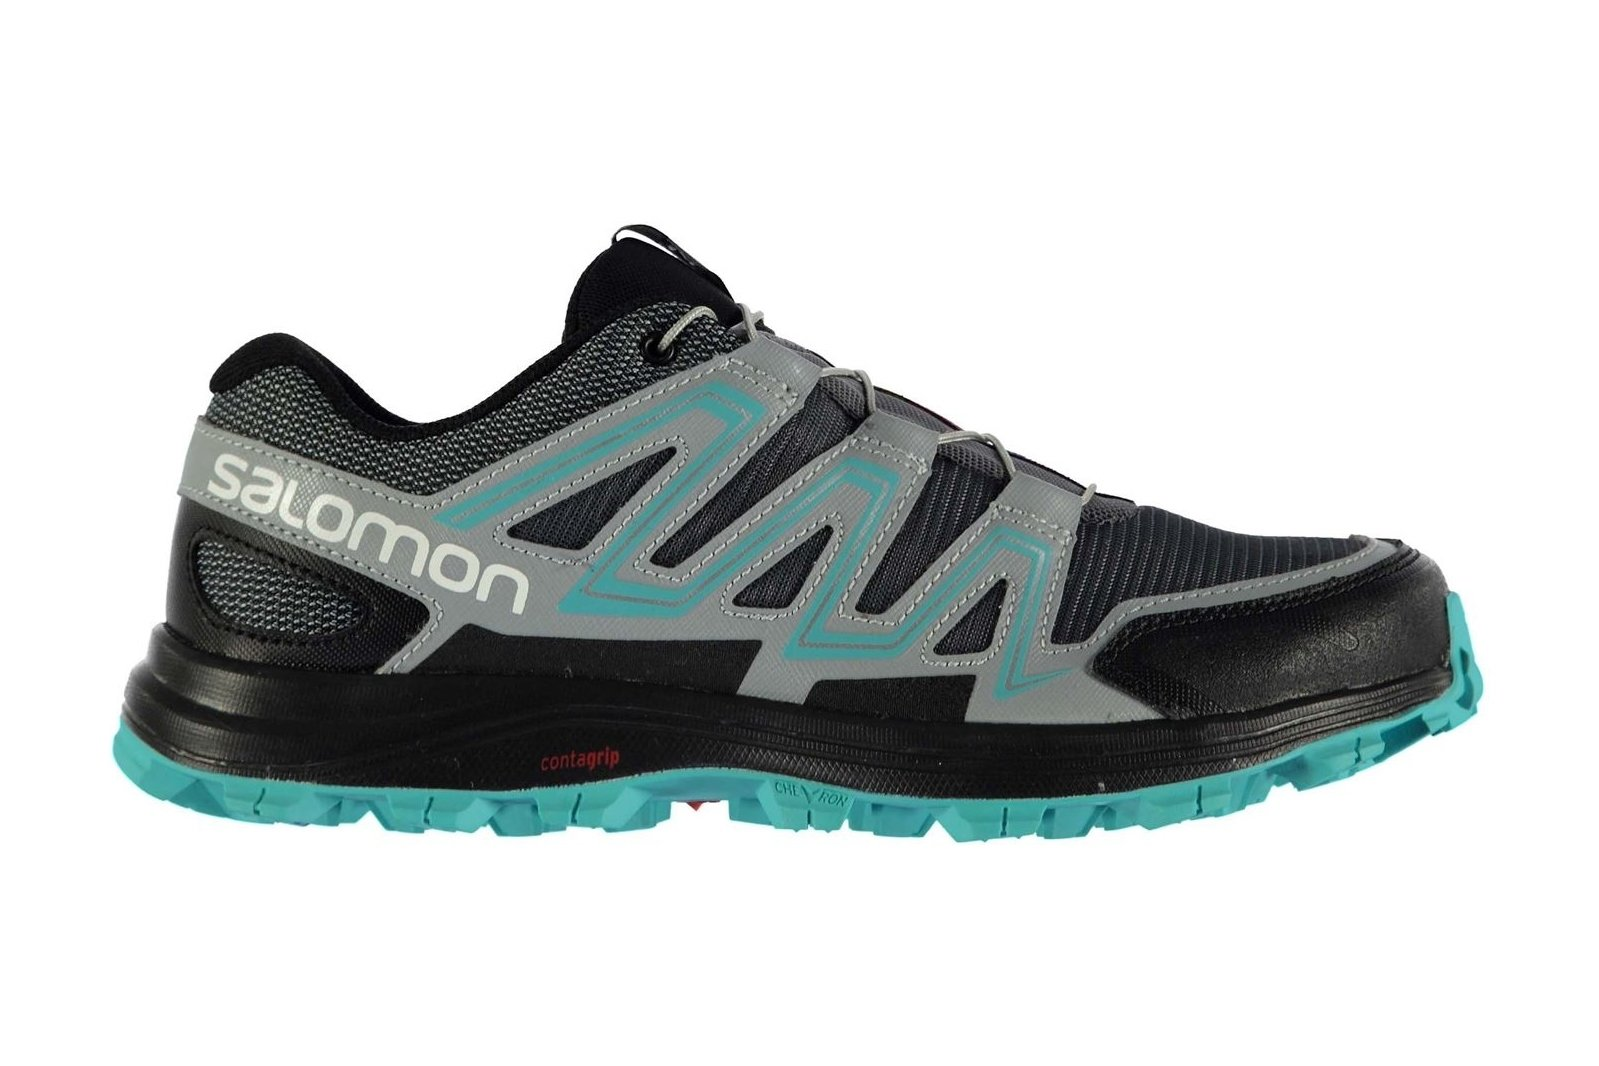 Details about Salomon Womens Speedtrak Running Shoes Sports Trainers Ladies Footwear Training